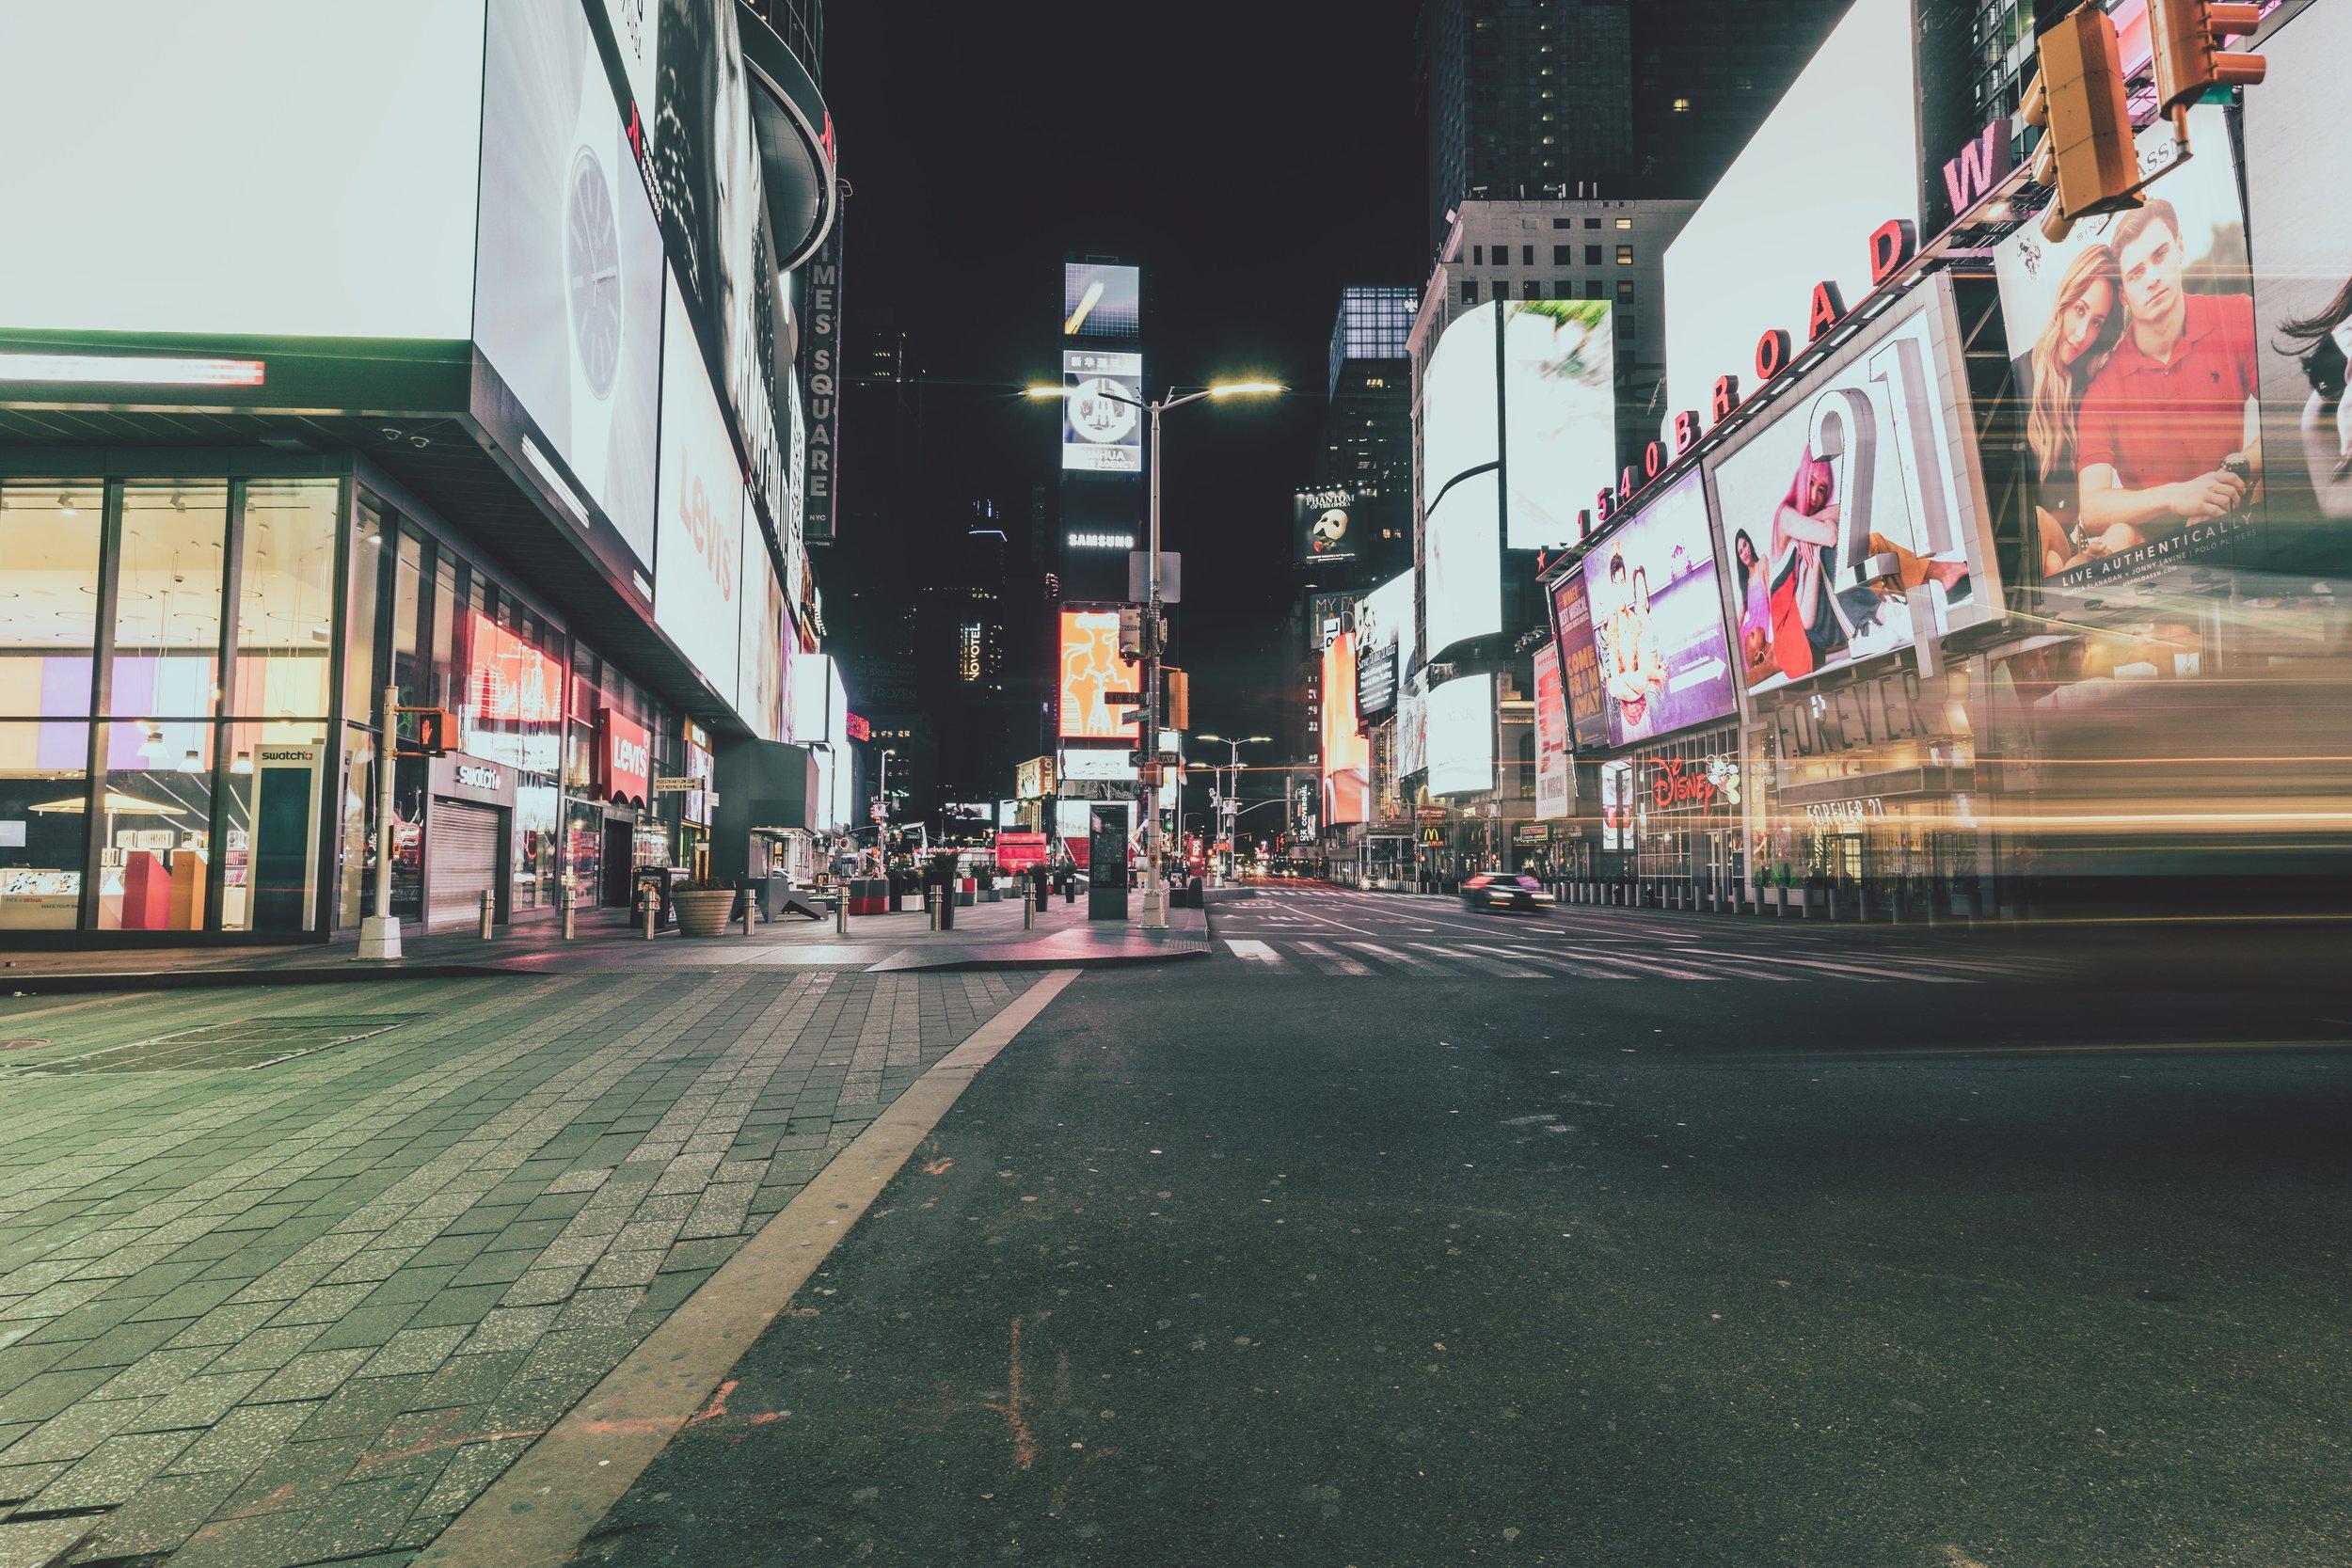 Empty times square new york city.jpg